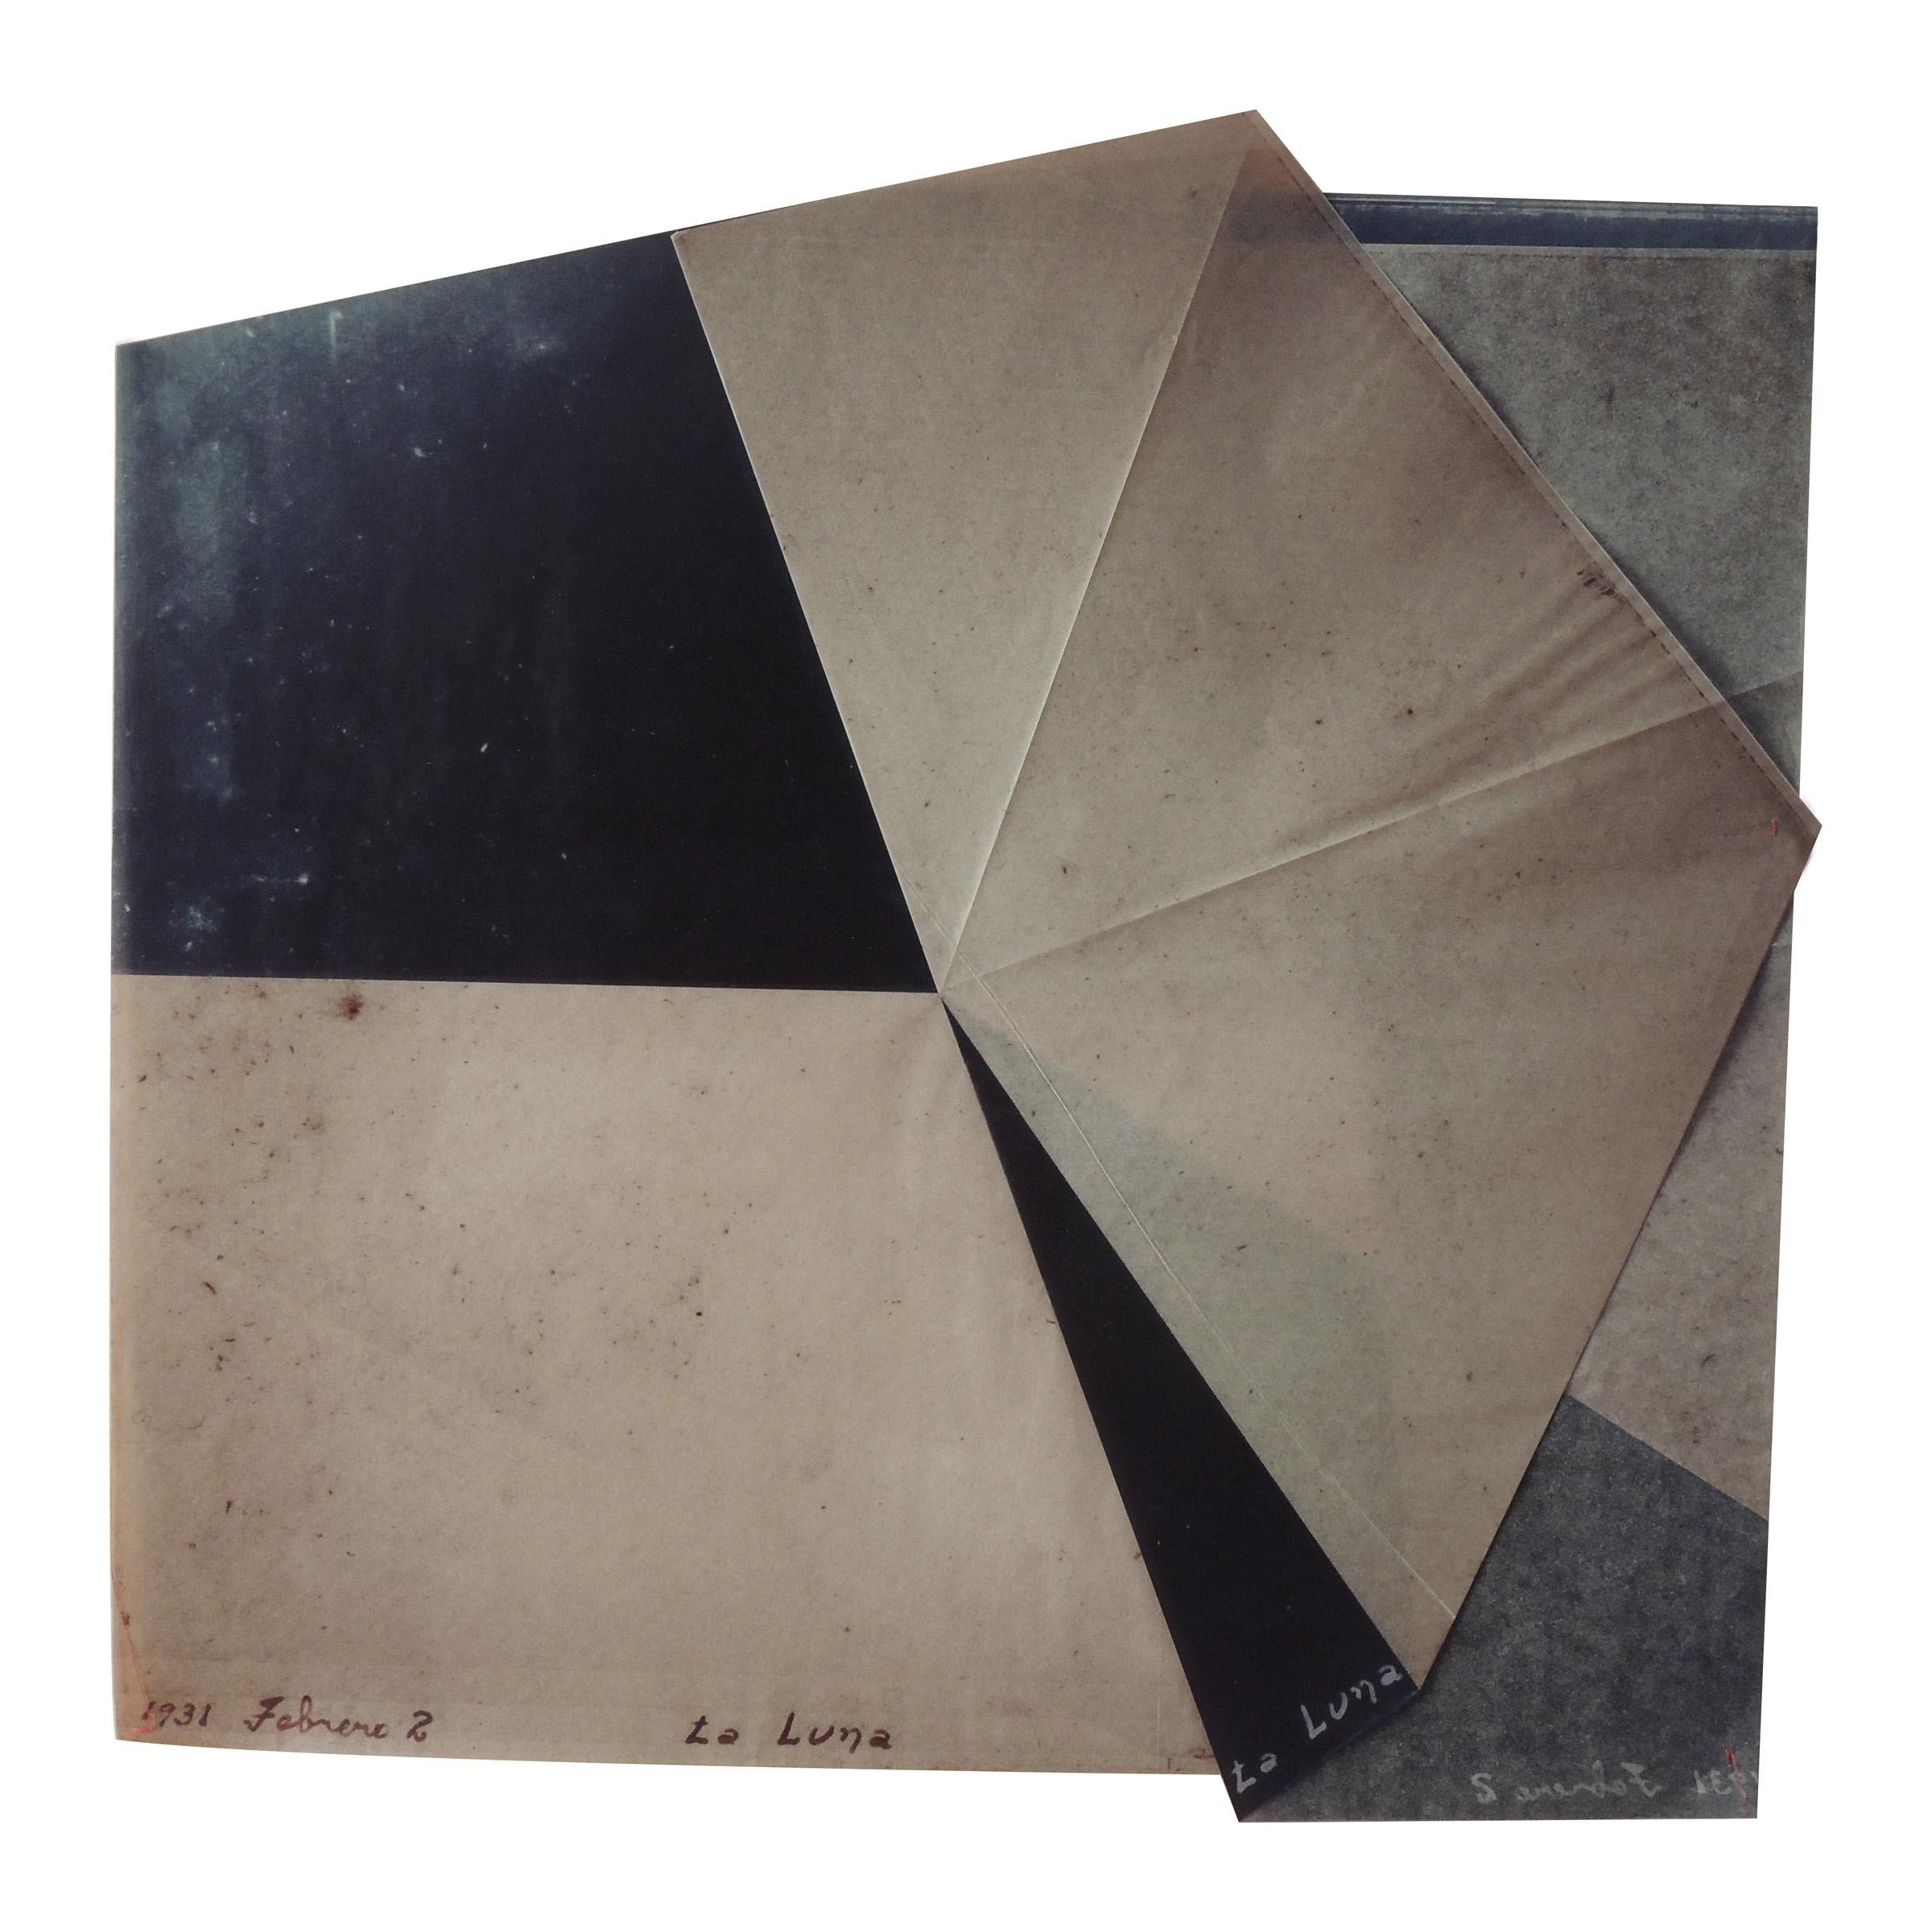 La Luna 2, 2016<br/>Impresión digital sobre papel cebolla / Inkjet print on onion paper